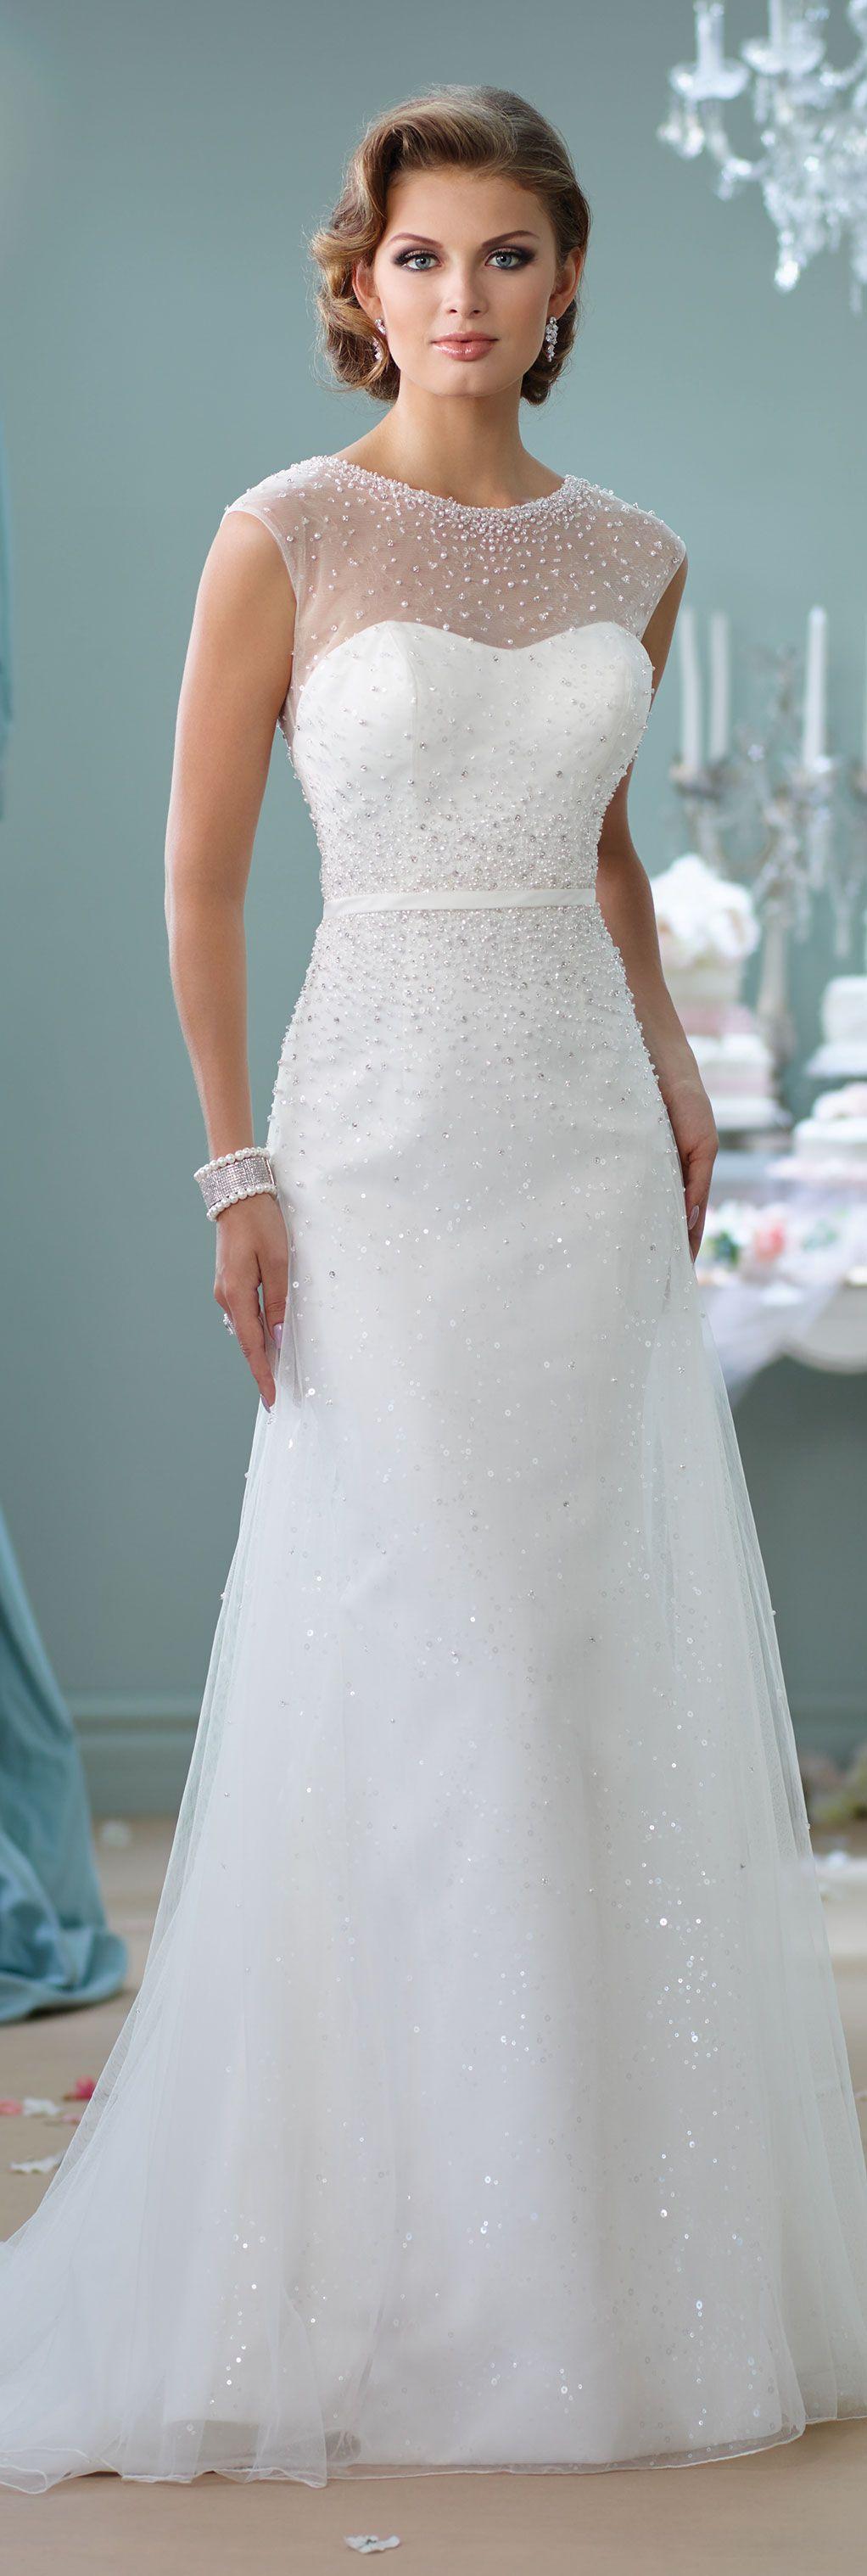 Modern wedding dresses by mon cheri wedding dress spring and